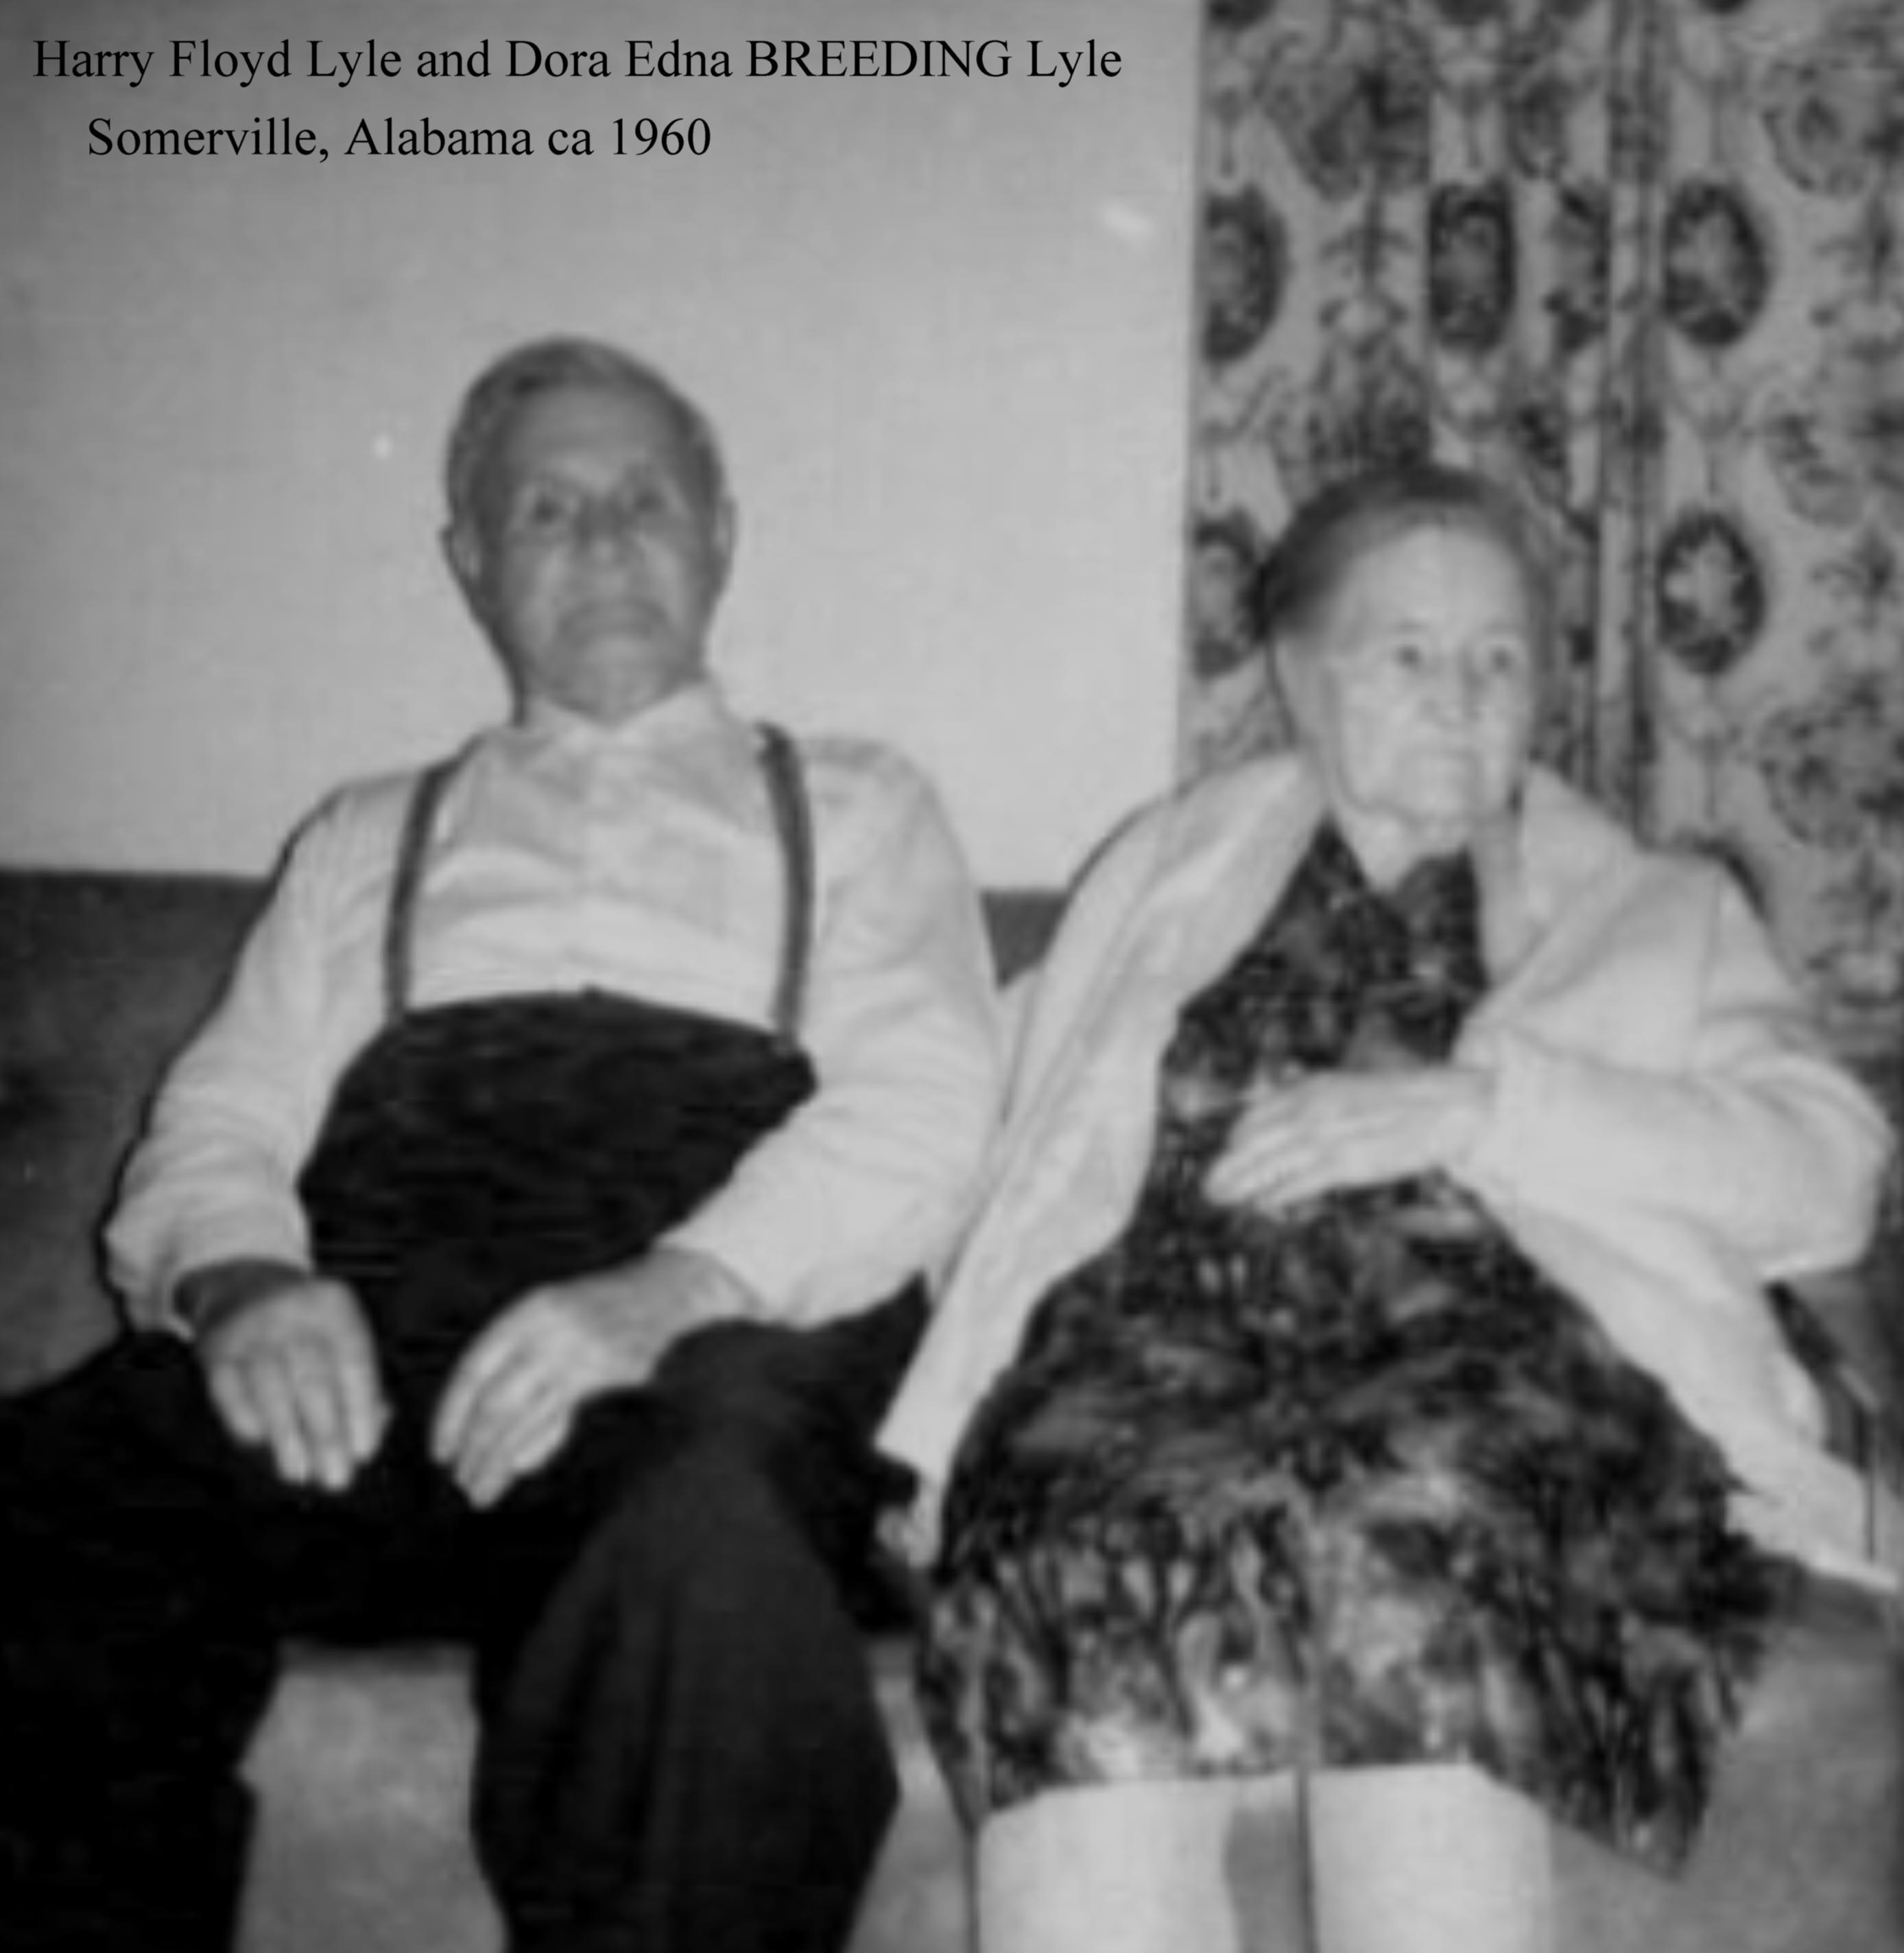 GranDad and Granny Lyle, My Great Grandparents, Harry Floyd Lyle and Dora Edna BREEDING Lyle (1960).....